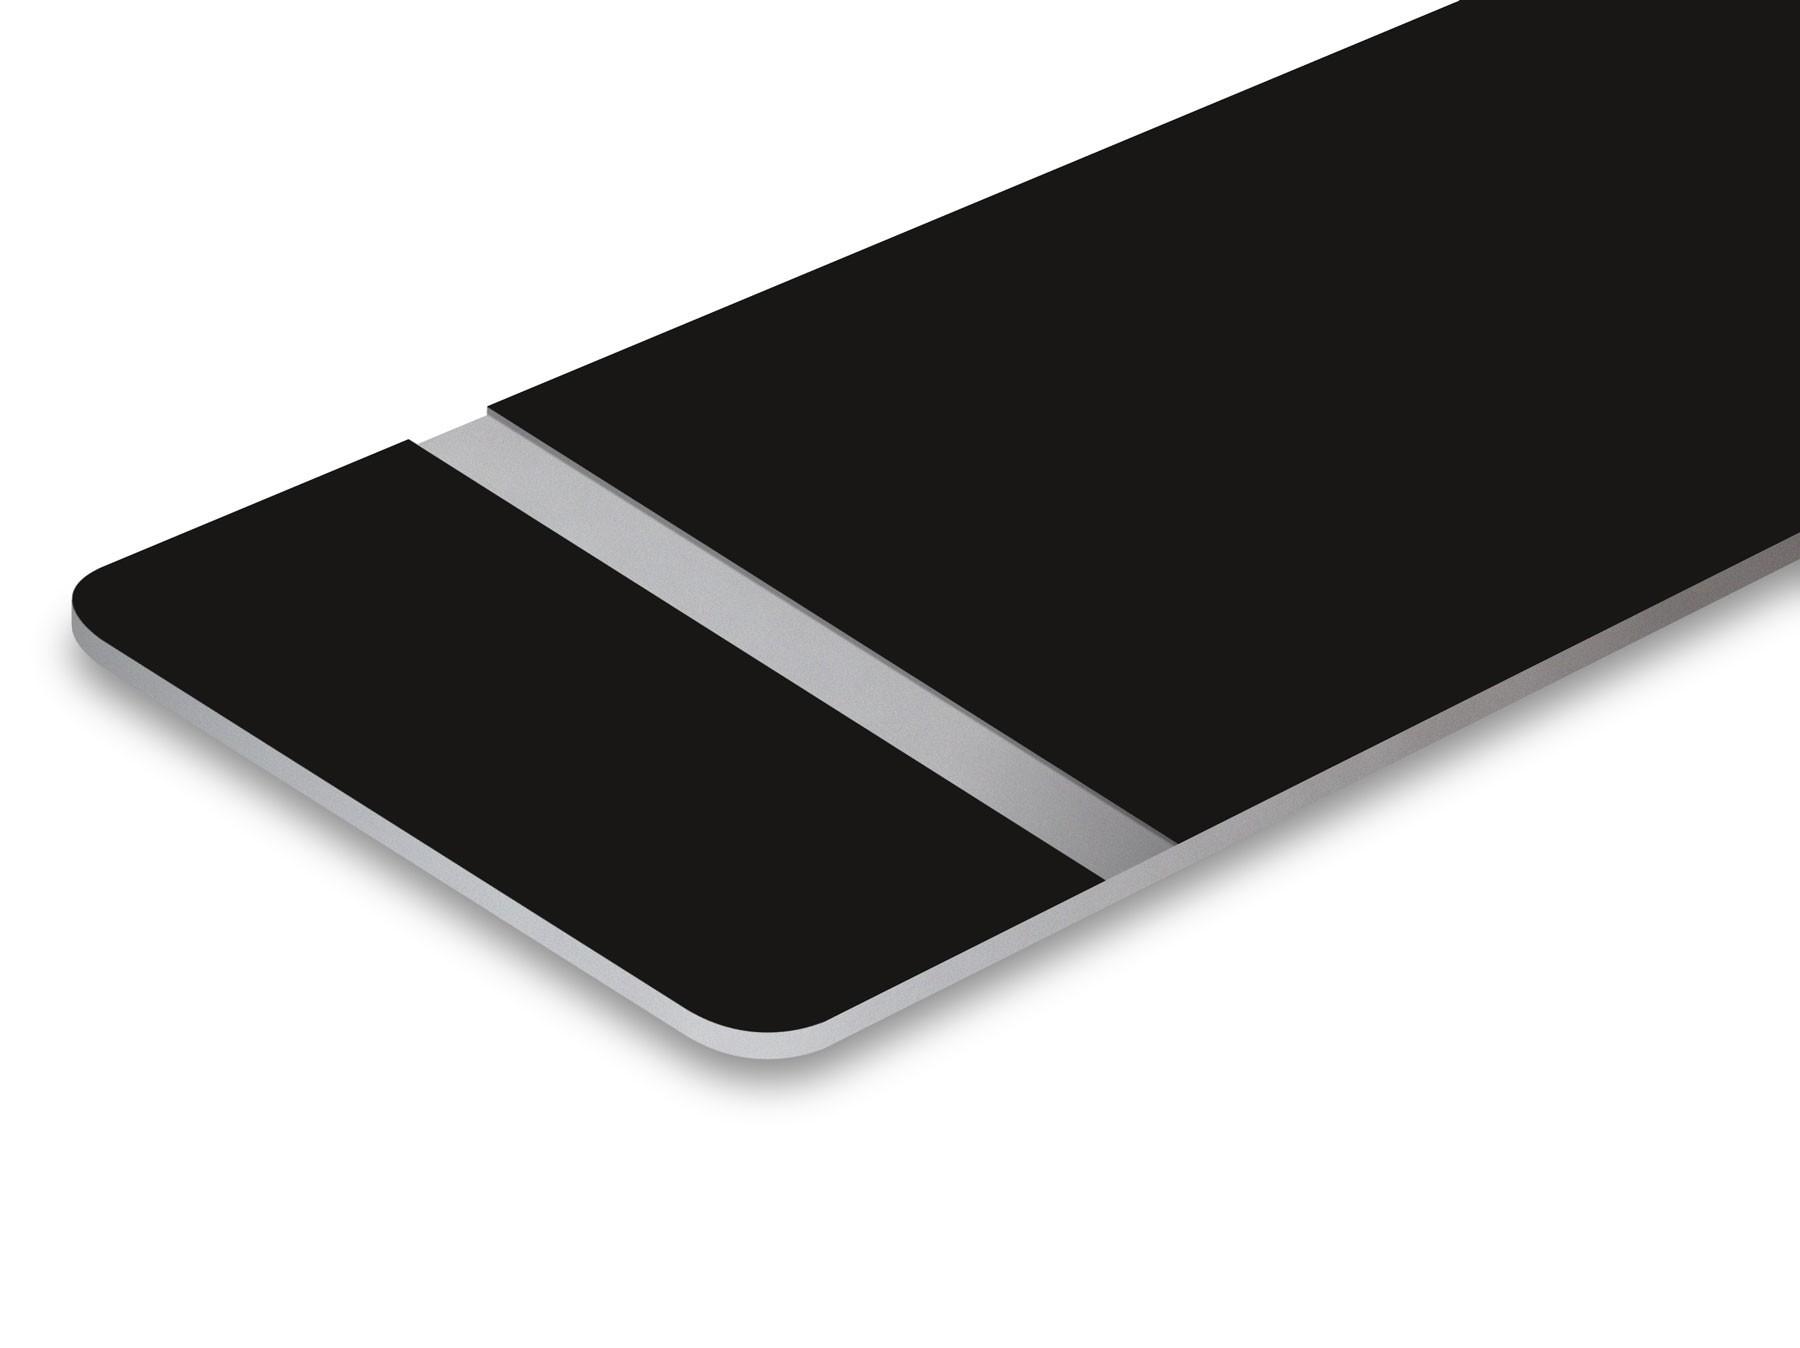 TroLase Lights, Black/Silver, 2ply, 0.1 mm